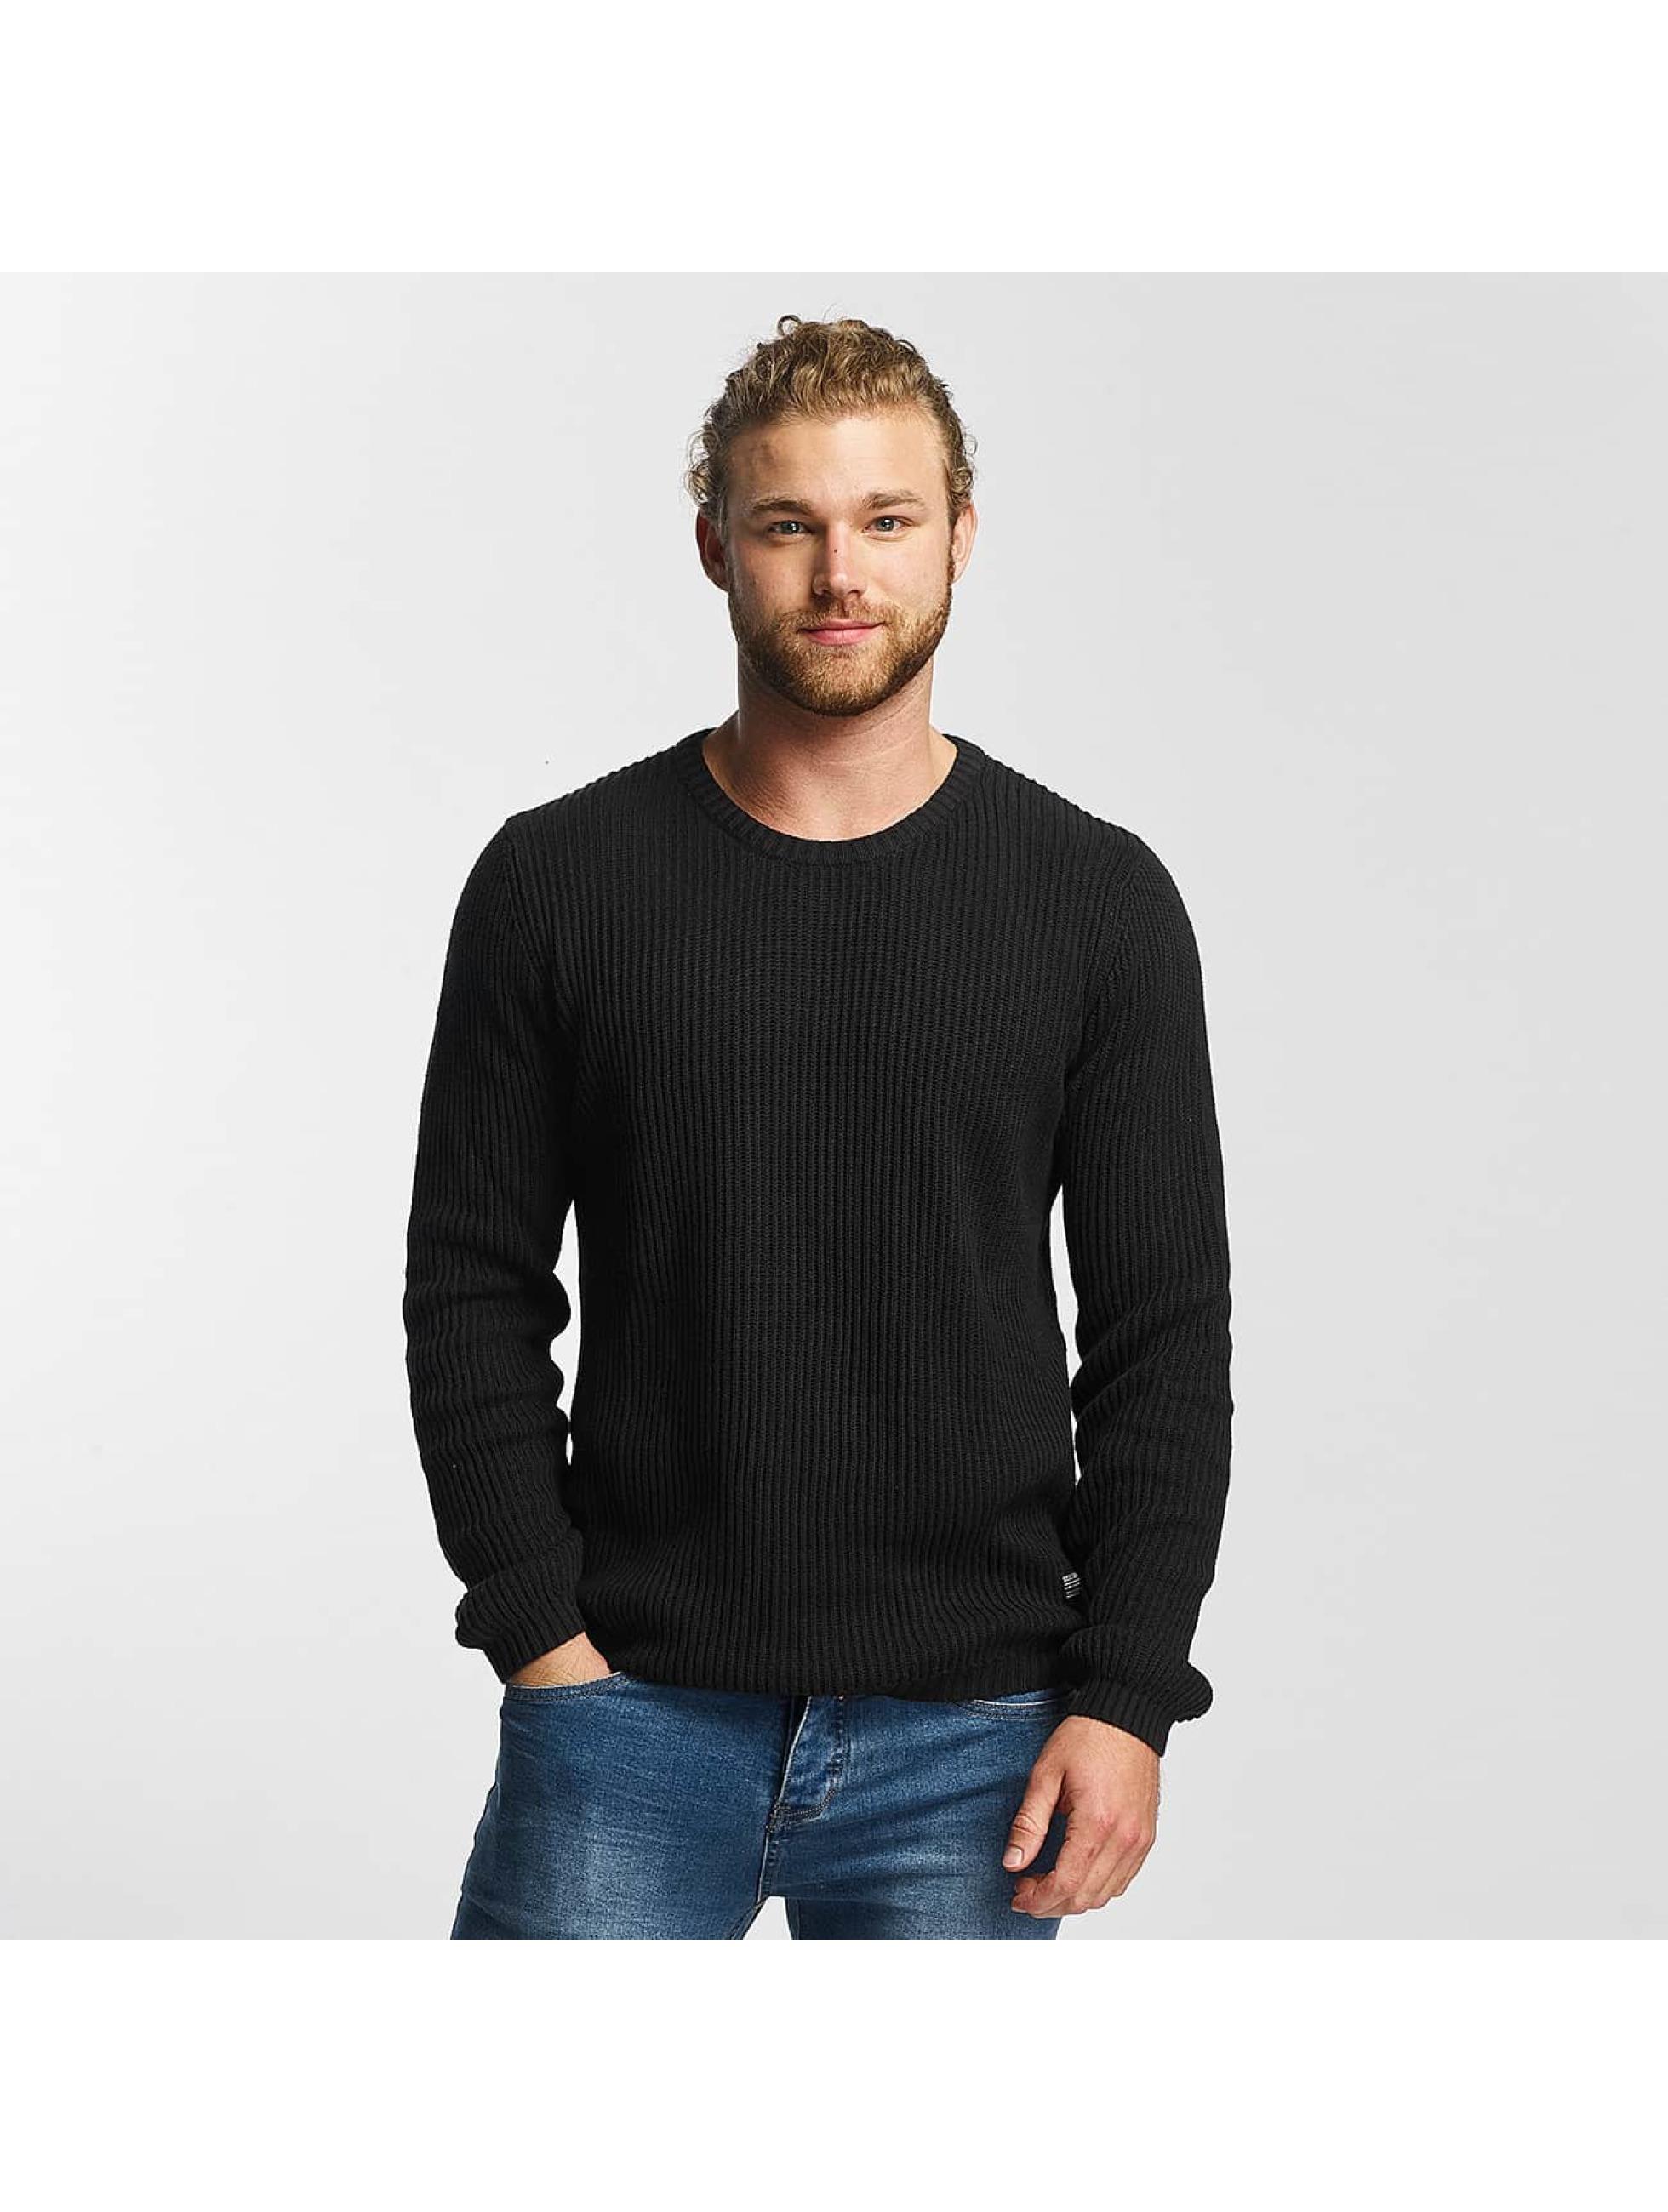 SHINE Original Männer Pullover O-Neck Knit in schwarz